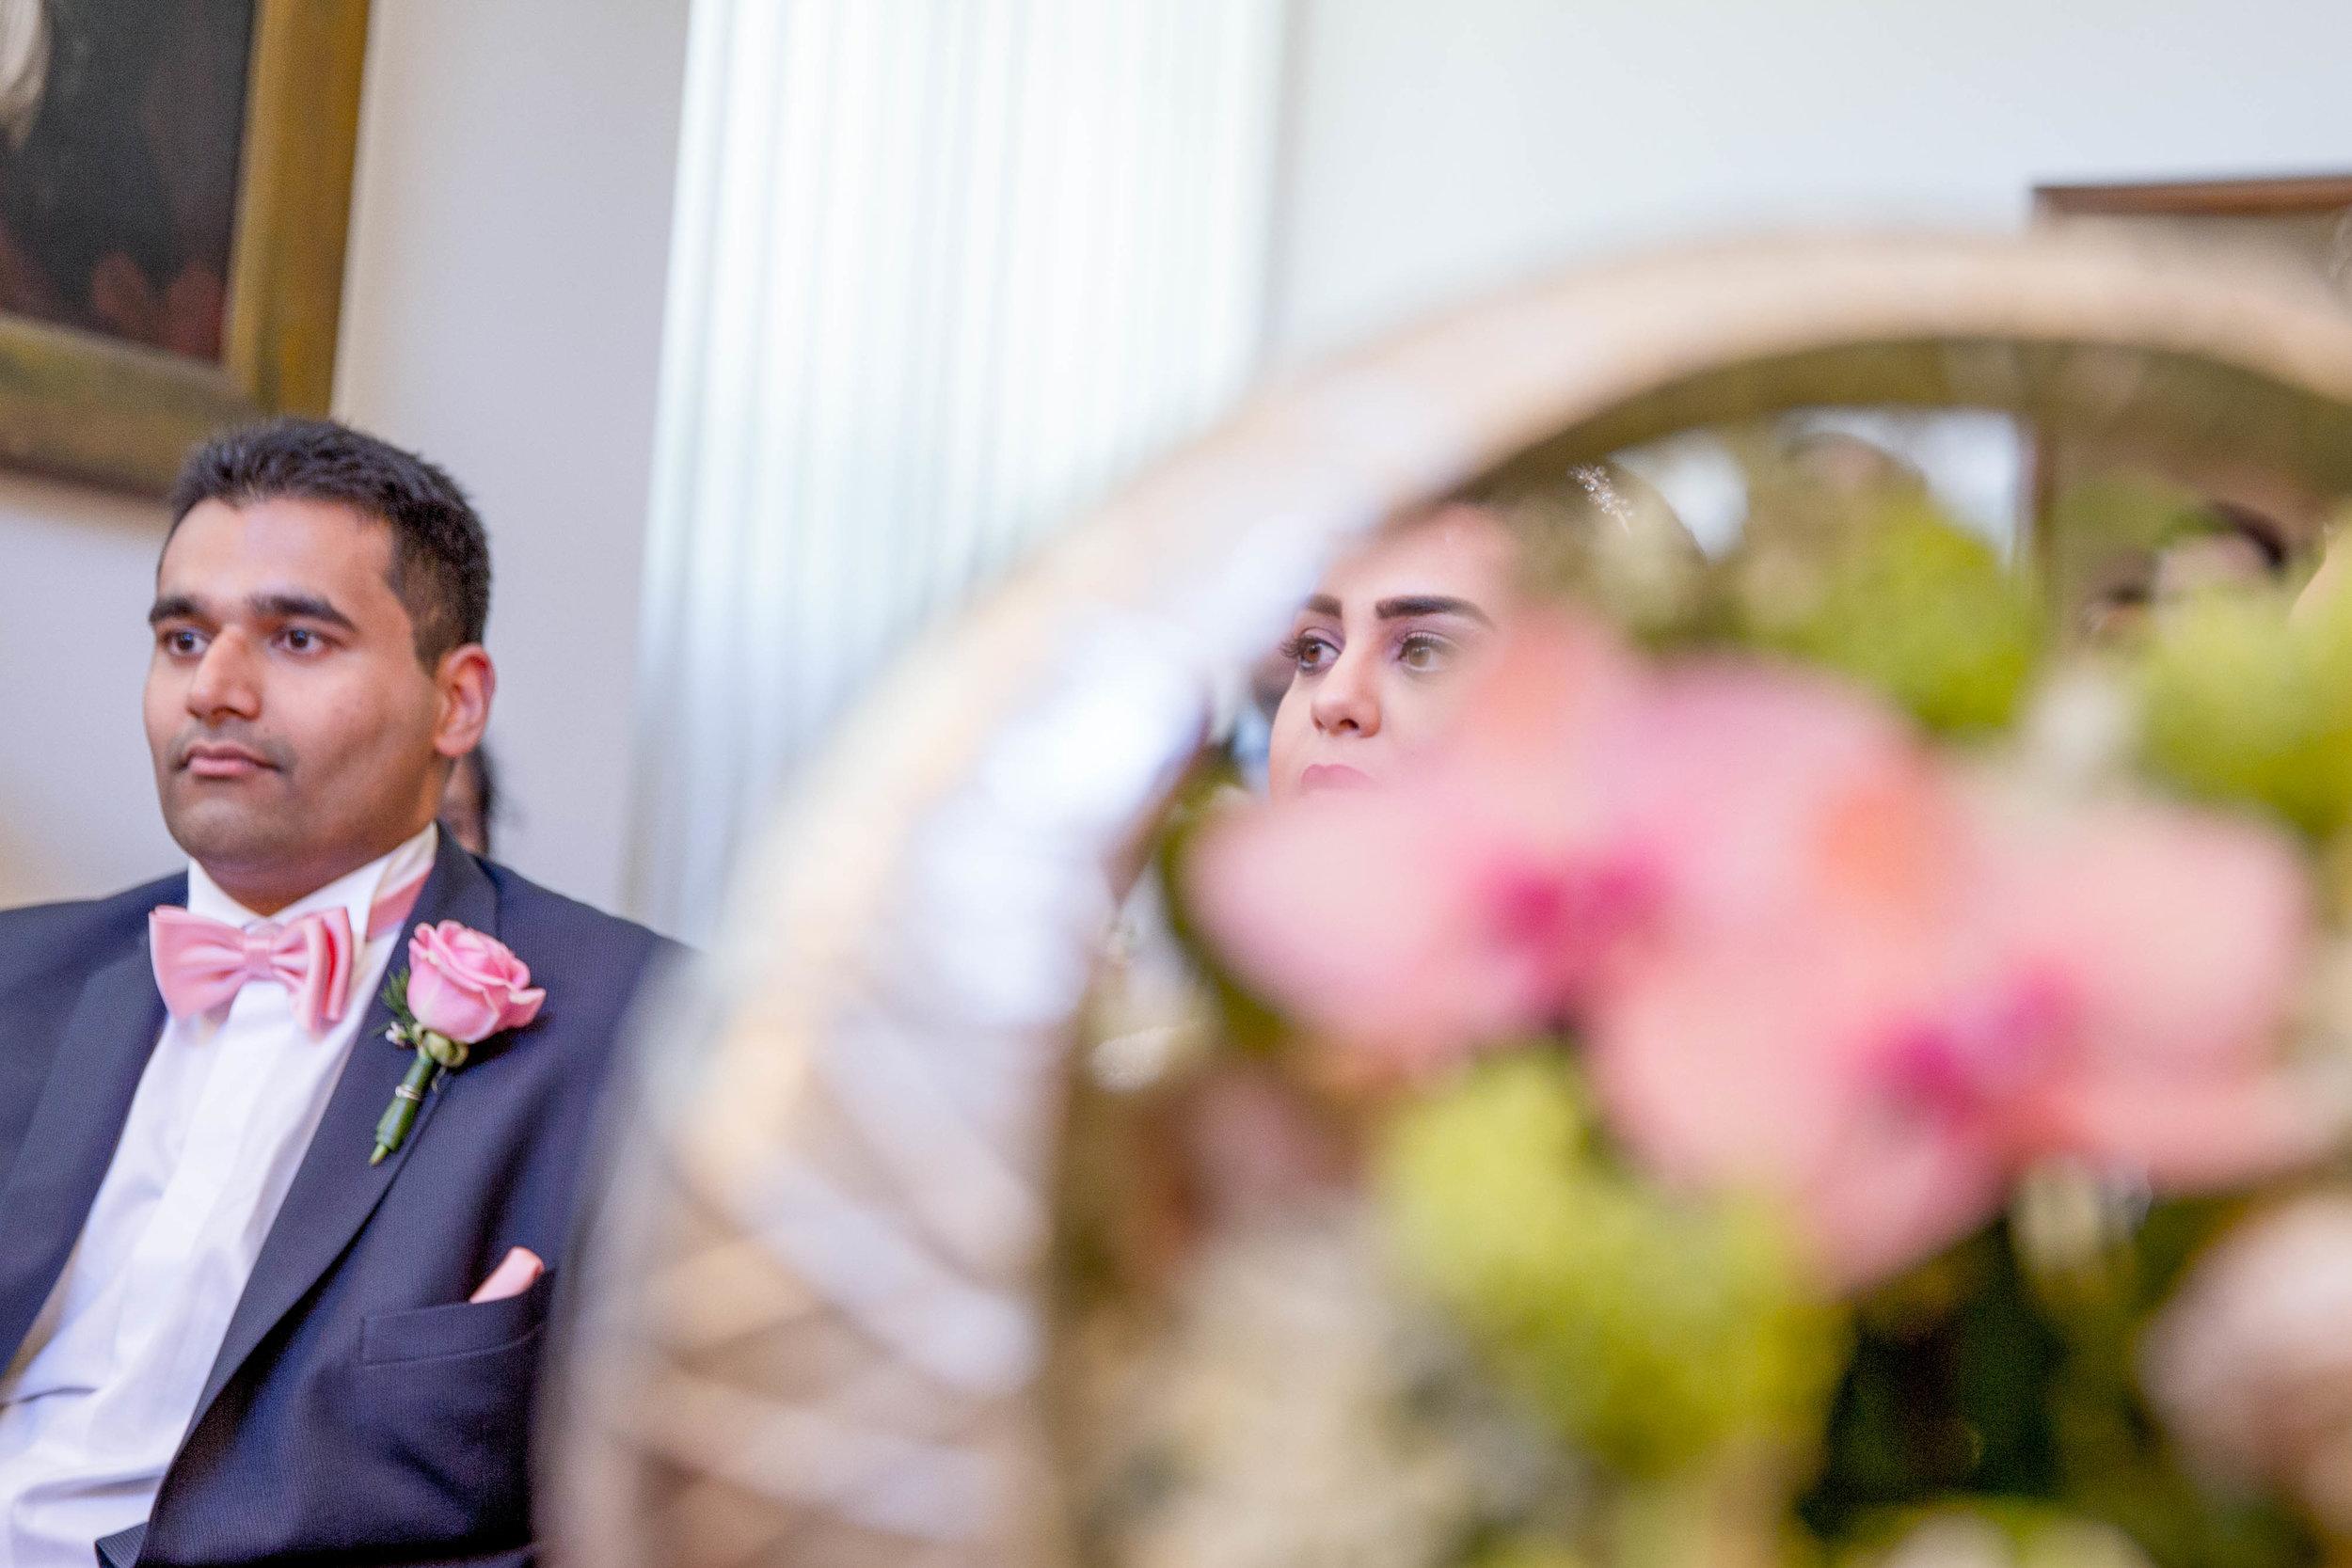 parc-des-eaux-vives-destination-wedding-photographer-geneva-switzerland-natalia-smith-photography-14.jpg